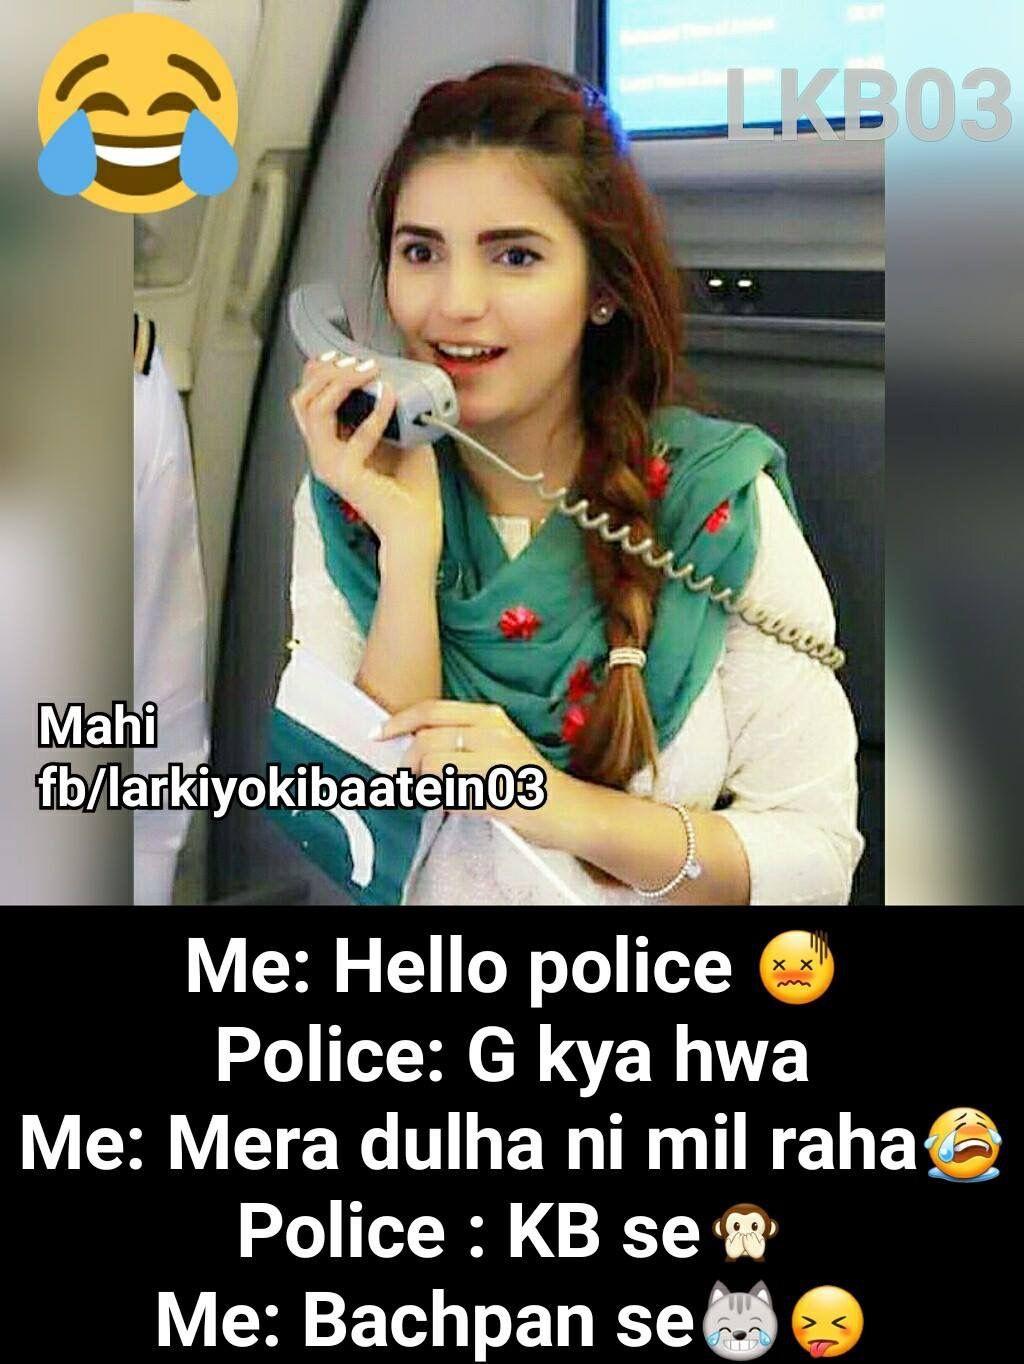 Punjabi Girl With Gun Hd Wallpaper Pin By Syed Zada On Girls Ki Batein Pinterest Attitude